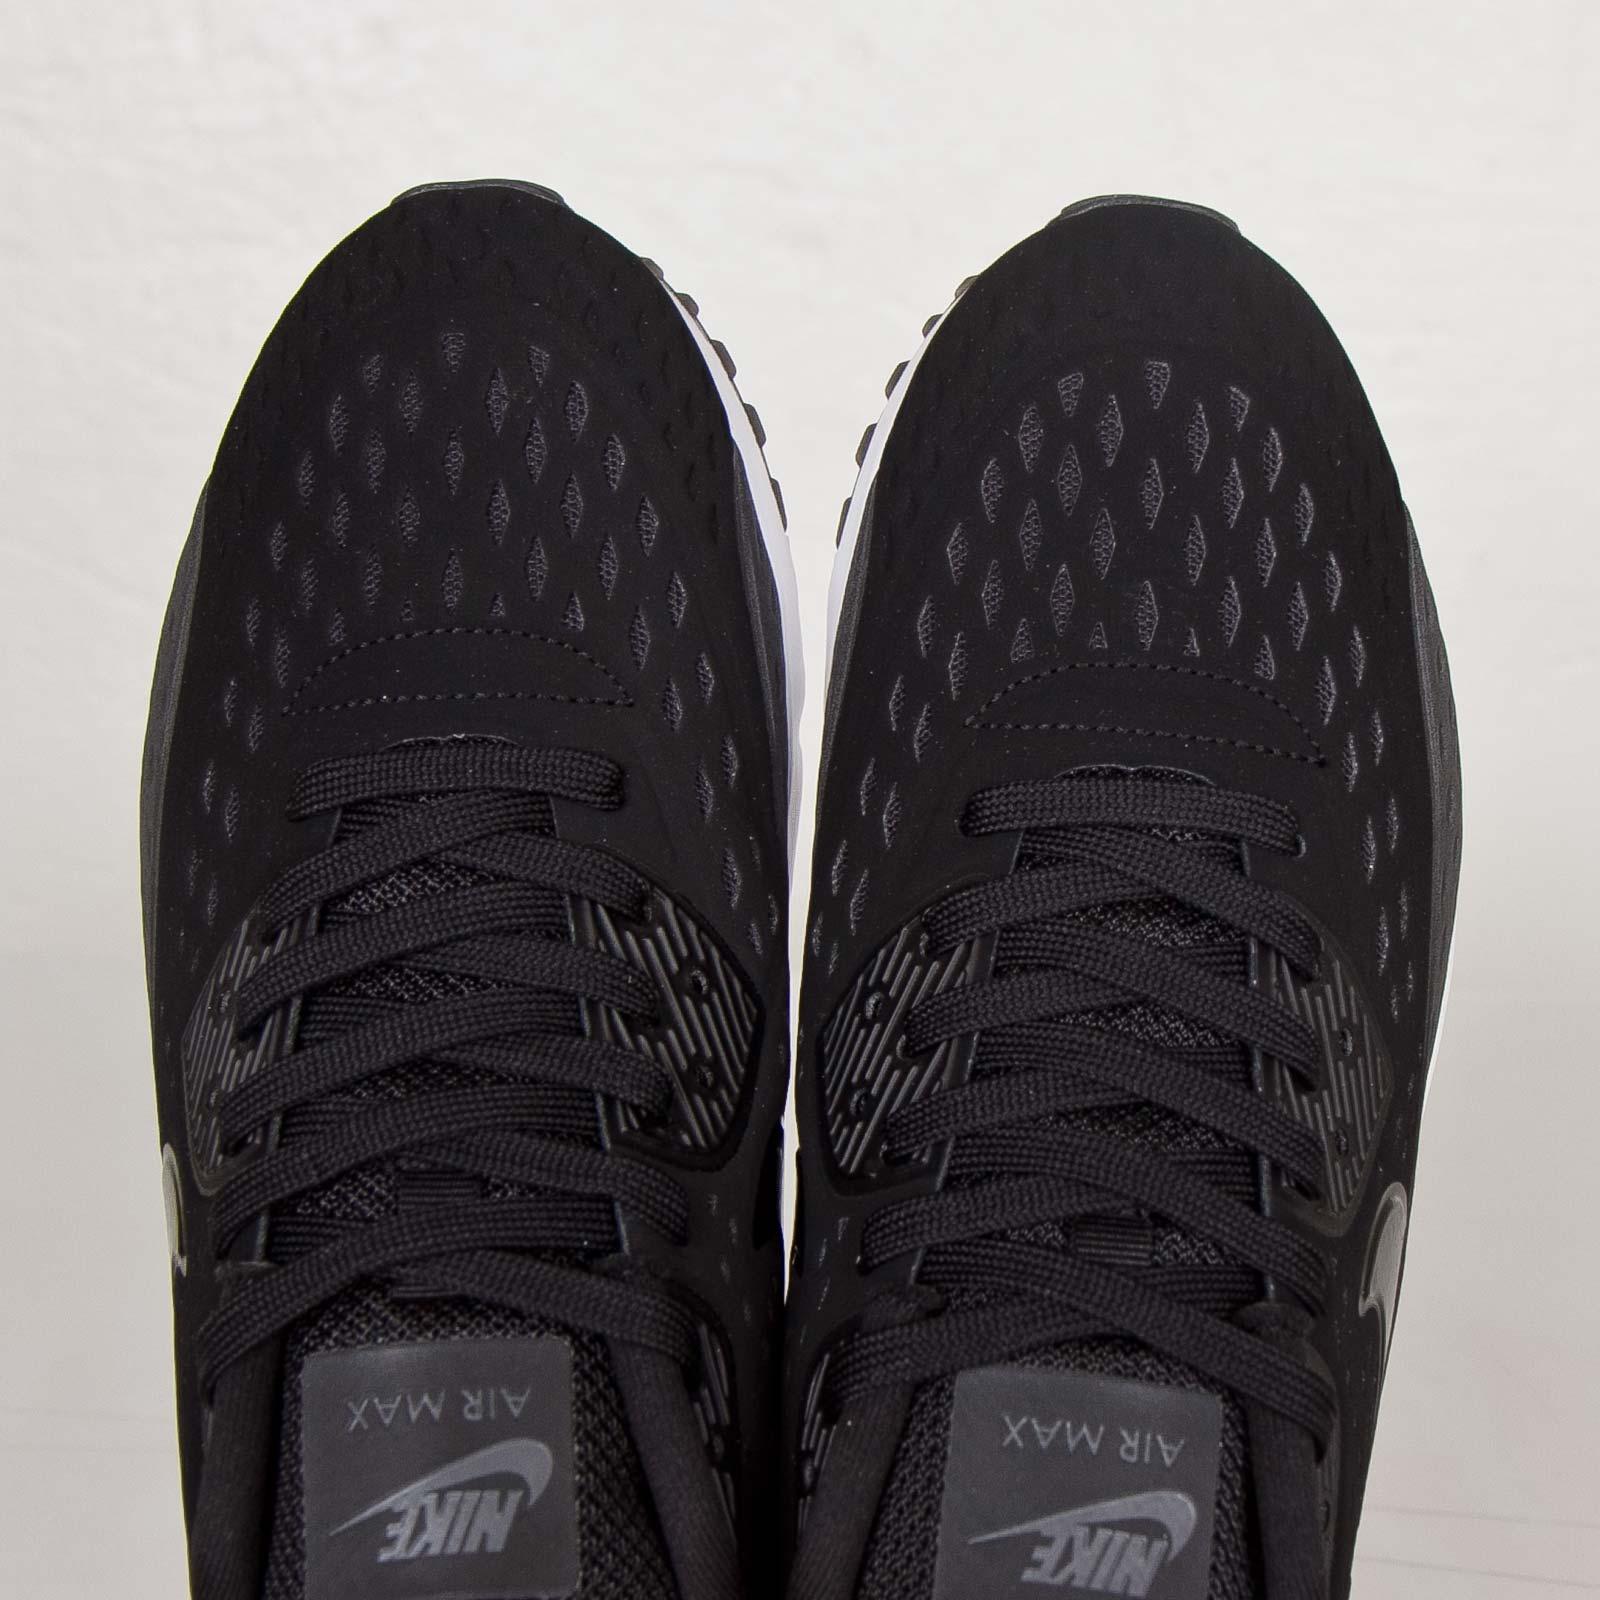 Nike Air Max 90 Ultra Br - 725222-001 - SNS | sneakers ...